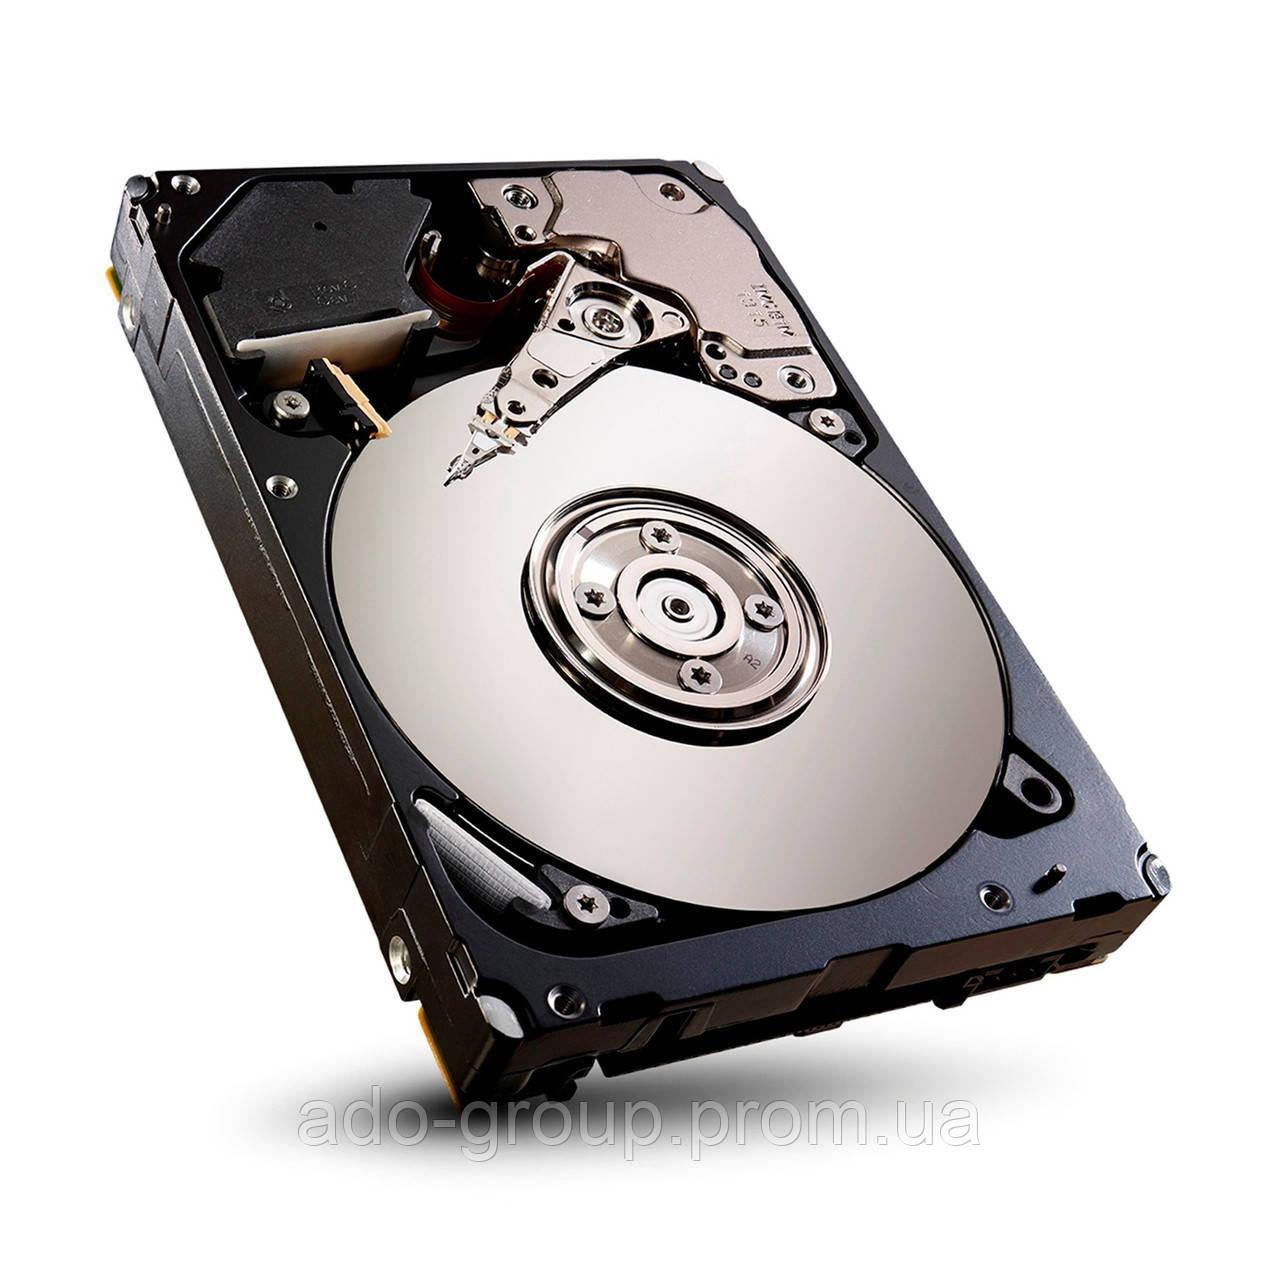 "431950-B21 Жесткий диск HP 300Gb SAS 15K  3.5"" +"